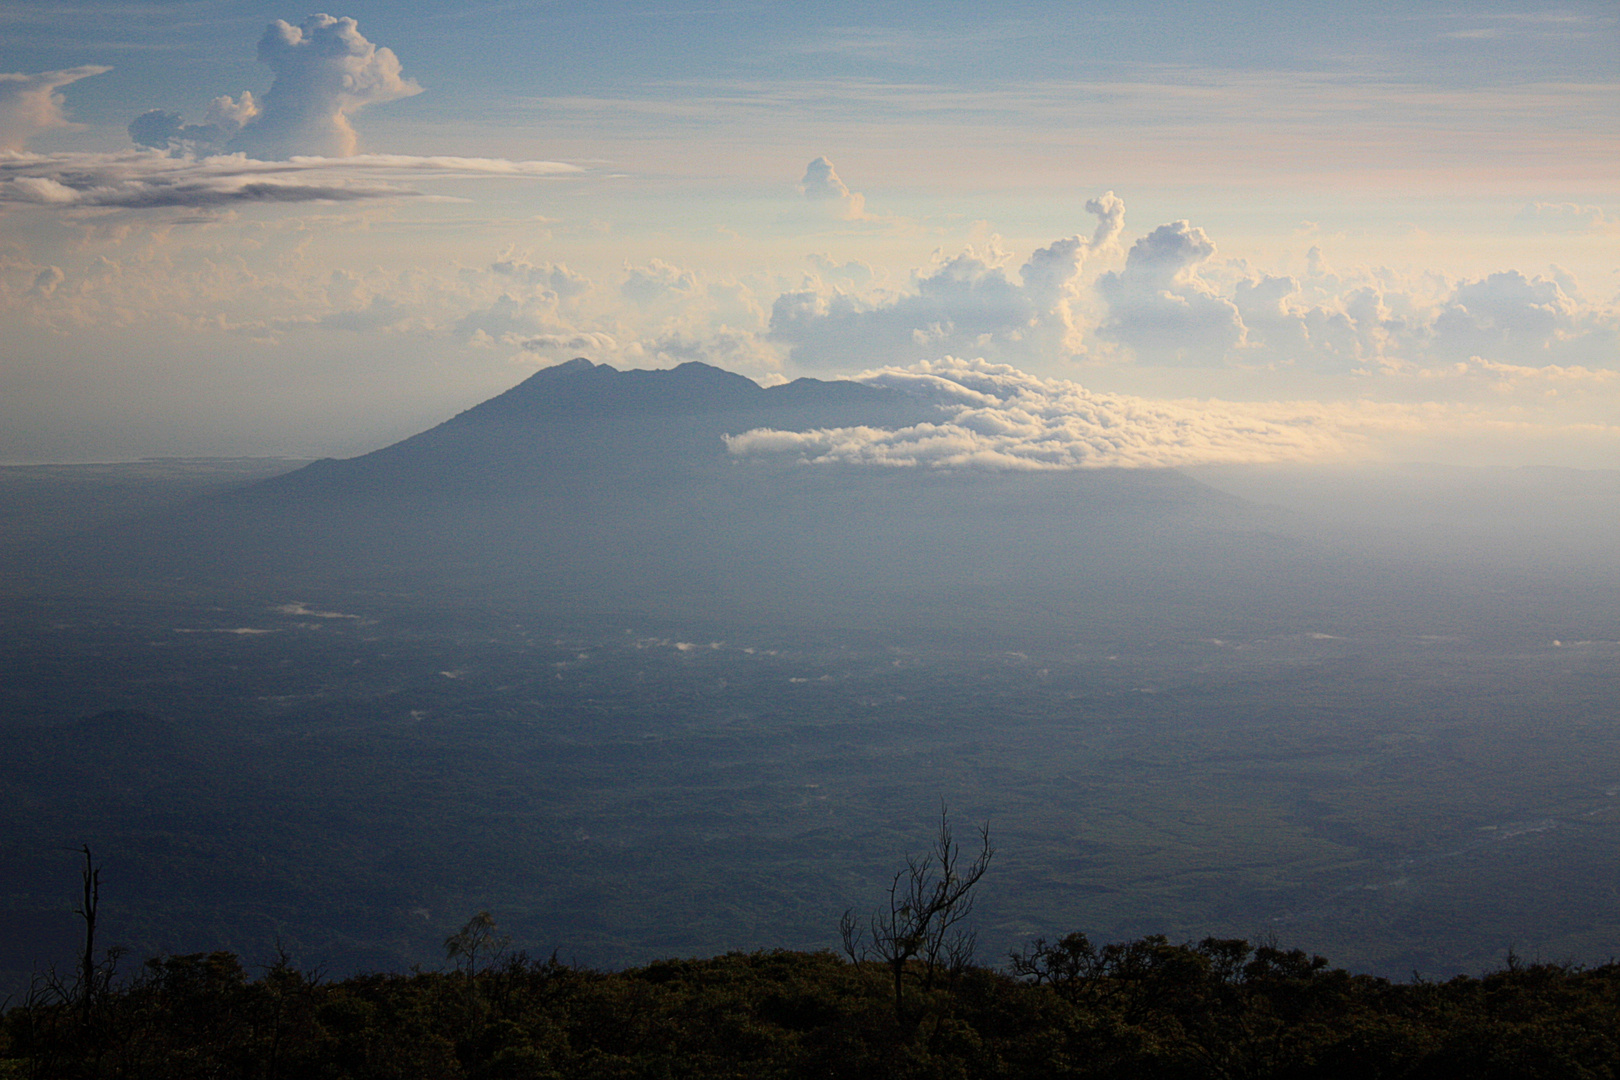 View from Kawah Ijen